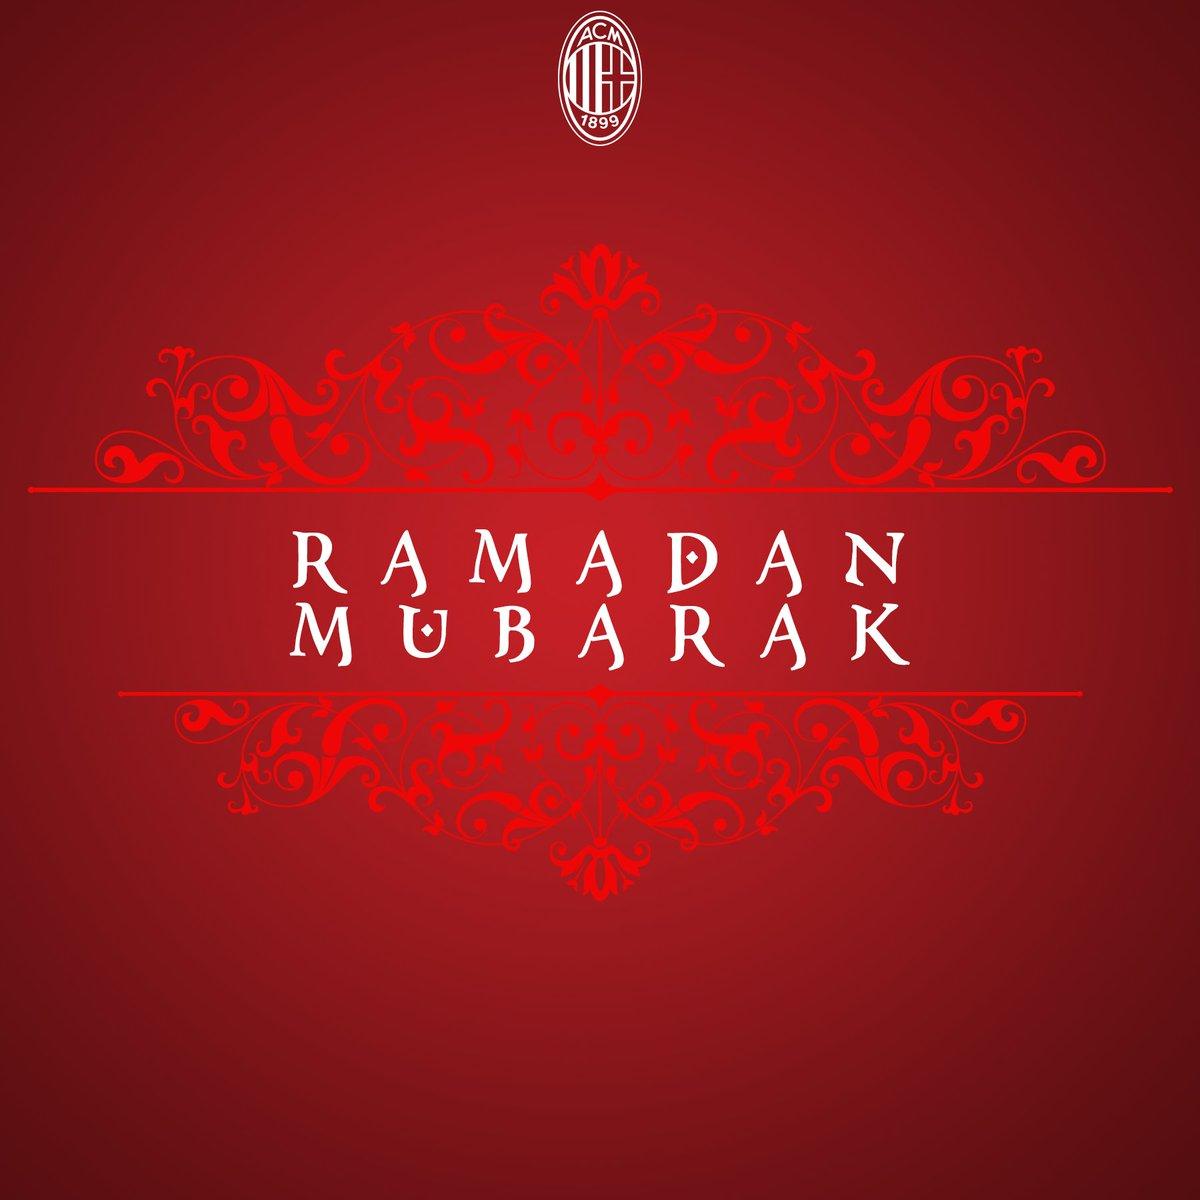 #Ramadan Mubarak to all those observing!